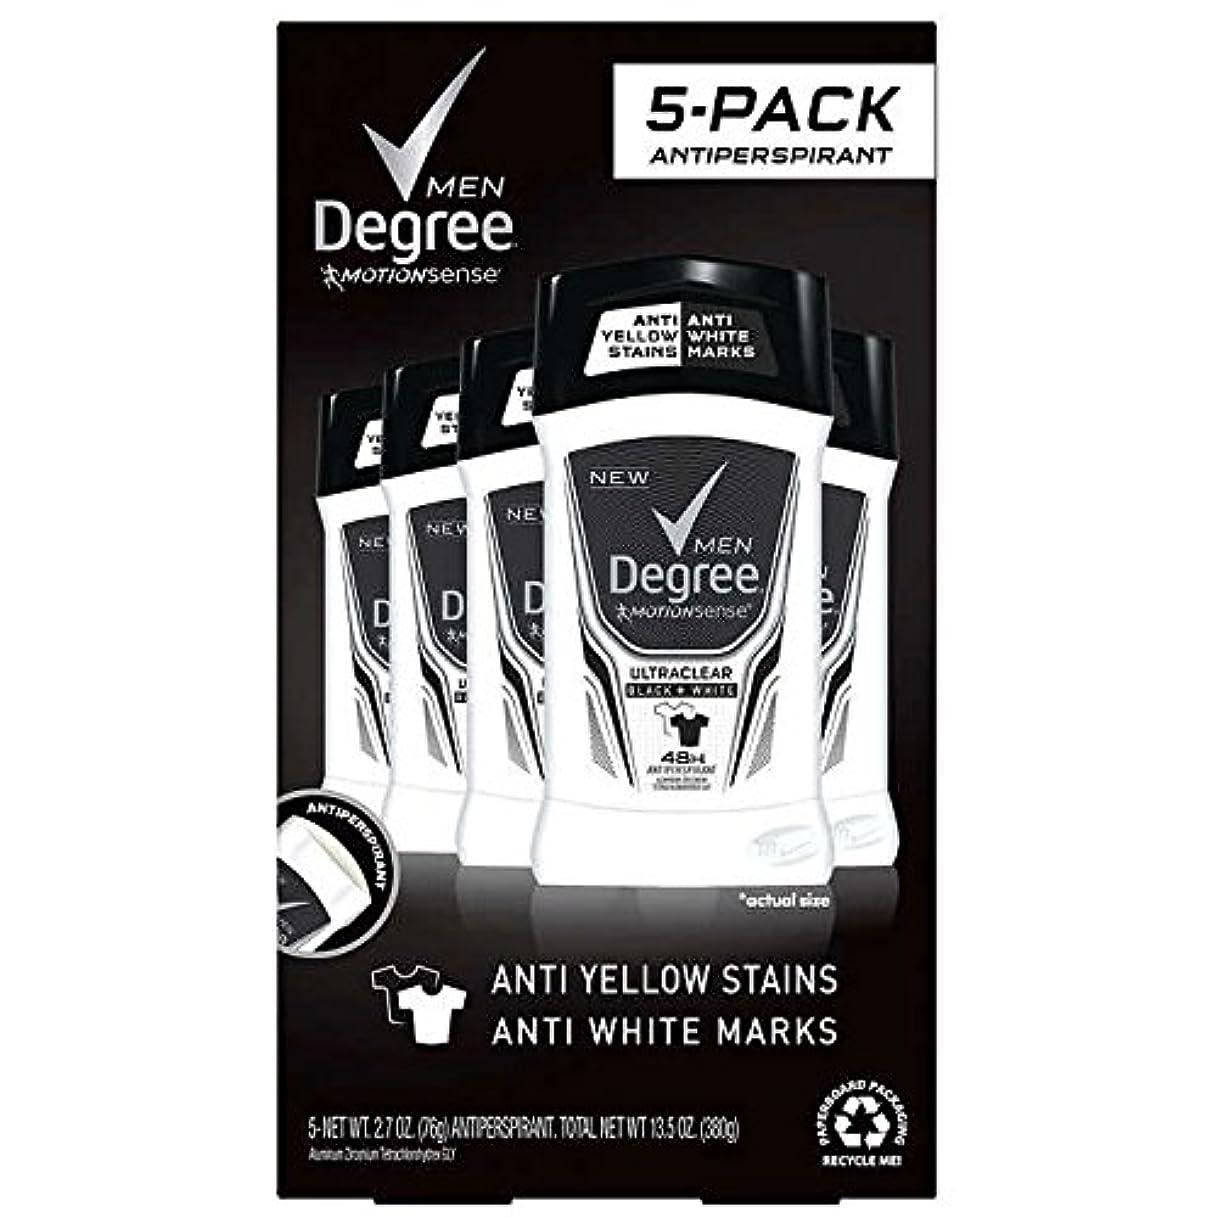 相手説教首相Degree Men Ultra Clear Black + White Solid Deodorant 2.7oz (76g), 5-pack [並行輸入品]